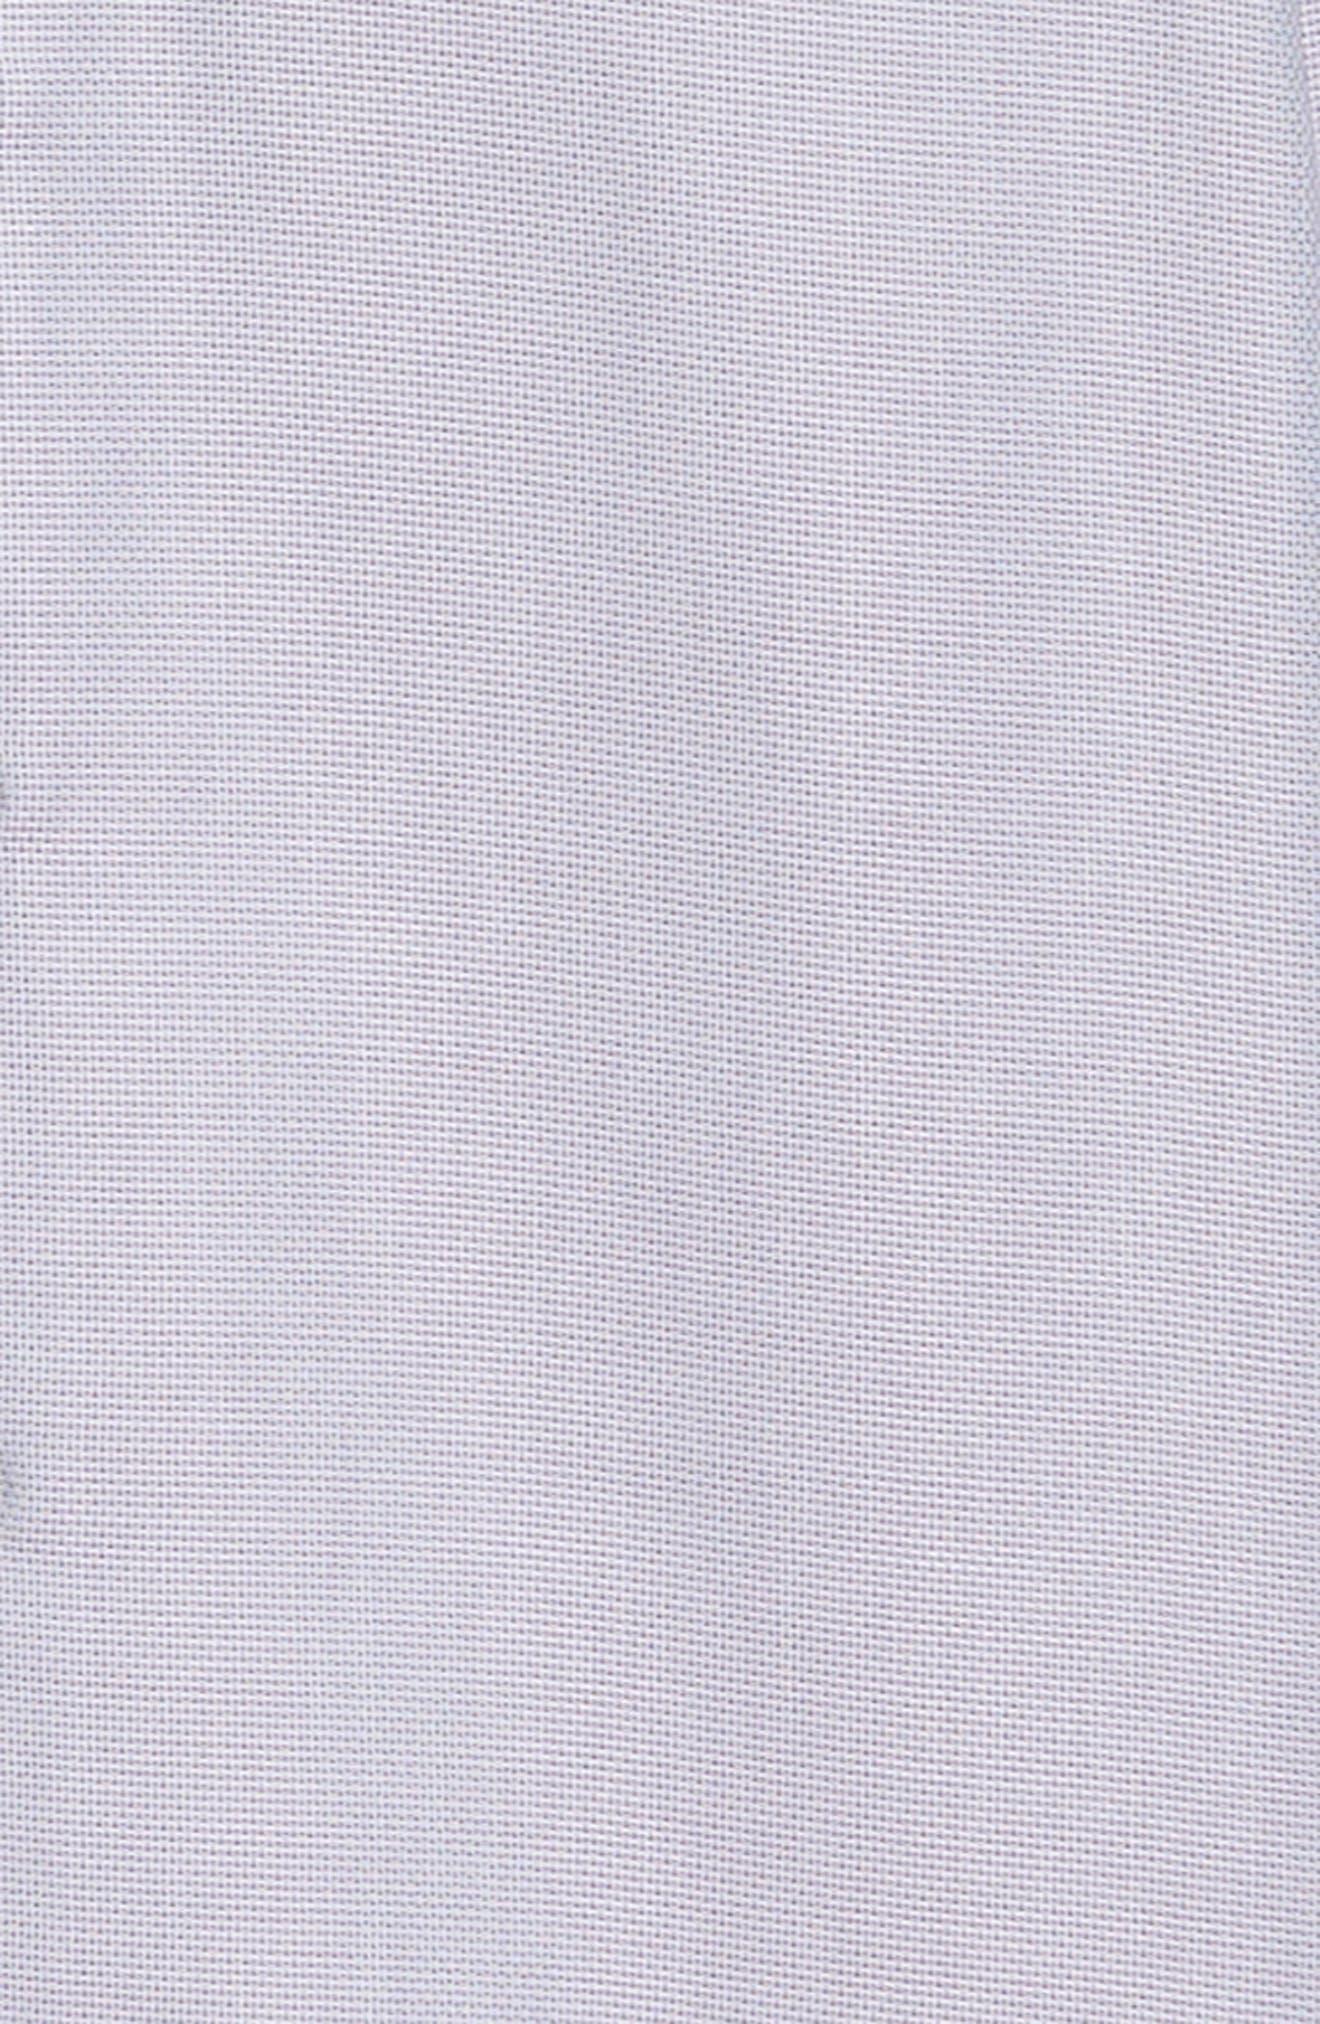 x Nordstrom Jerrin Slim Fit Solid Dress Shirt,                             Alternate thumbnail 6, color,                             LAVENDER